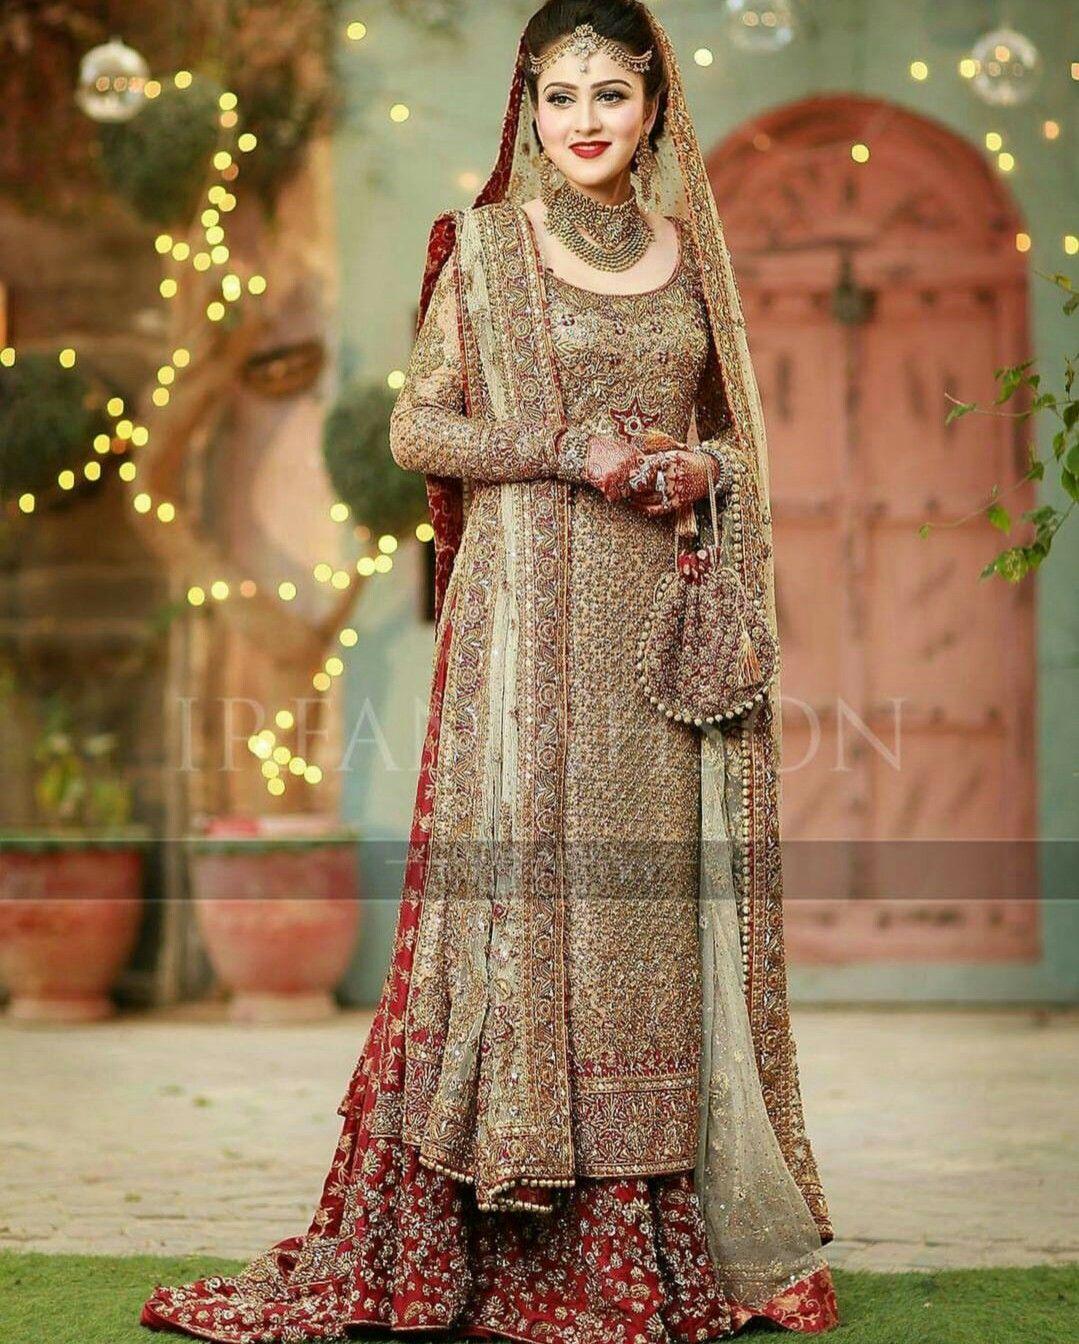 Awesome Pakistani Bridal Look